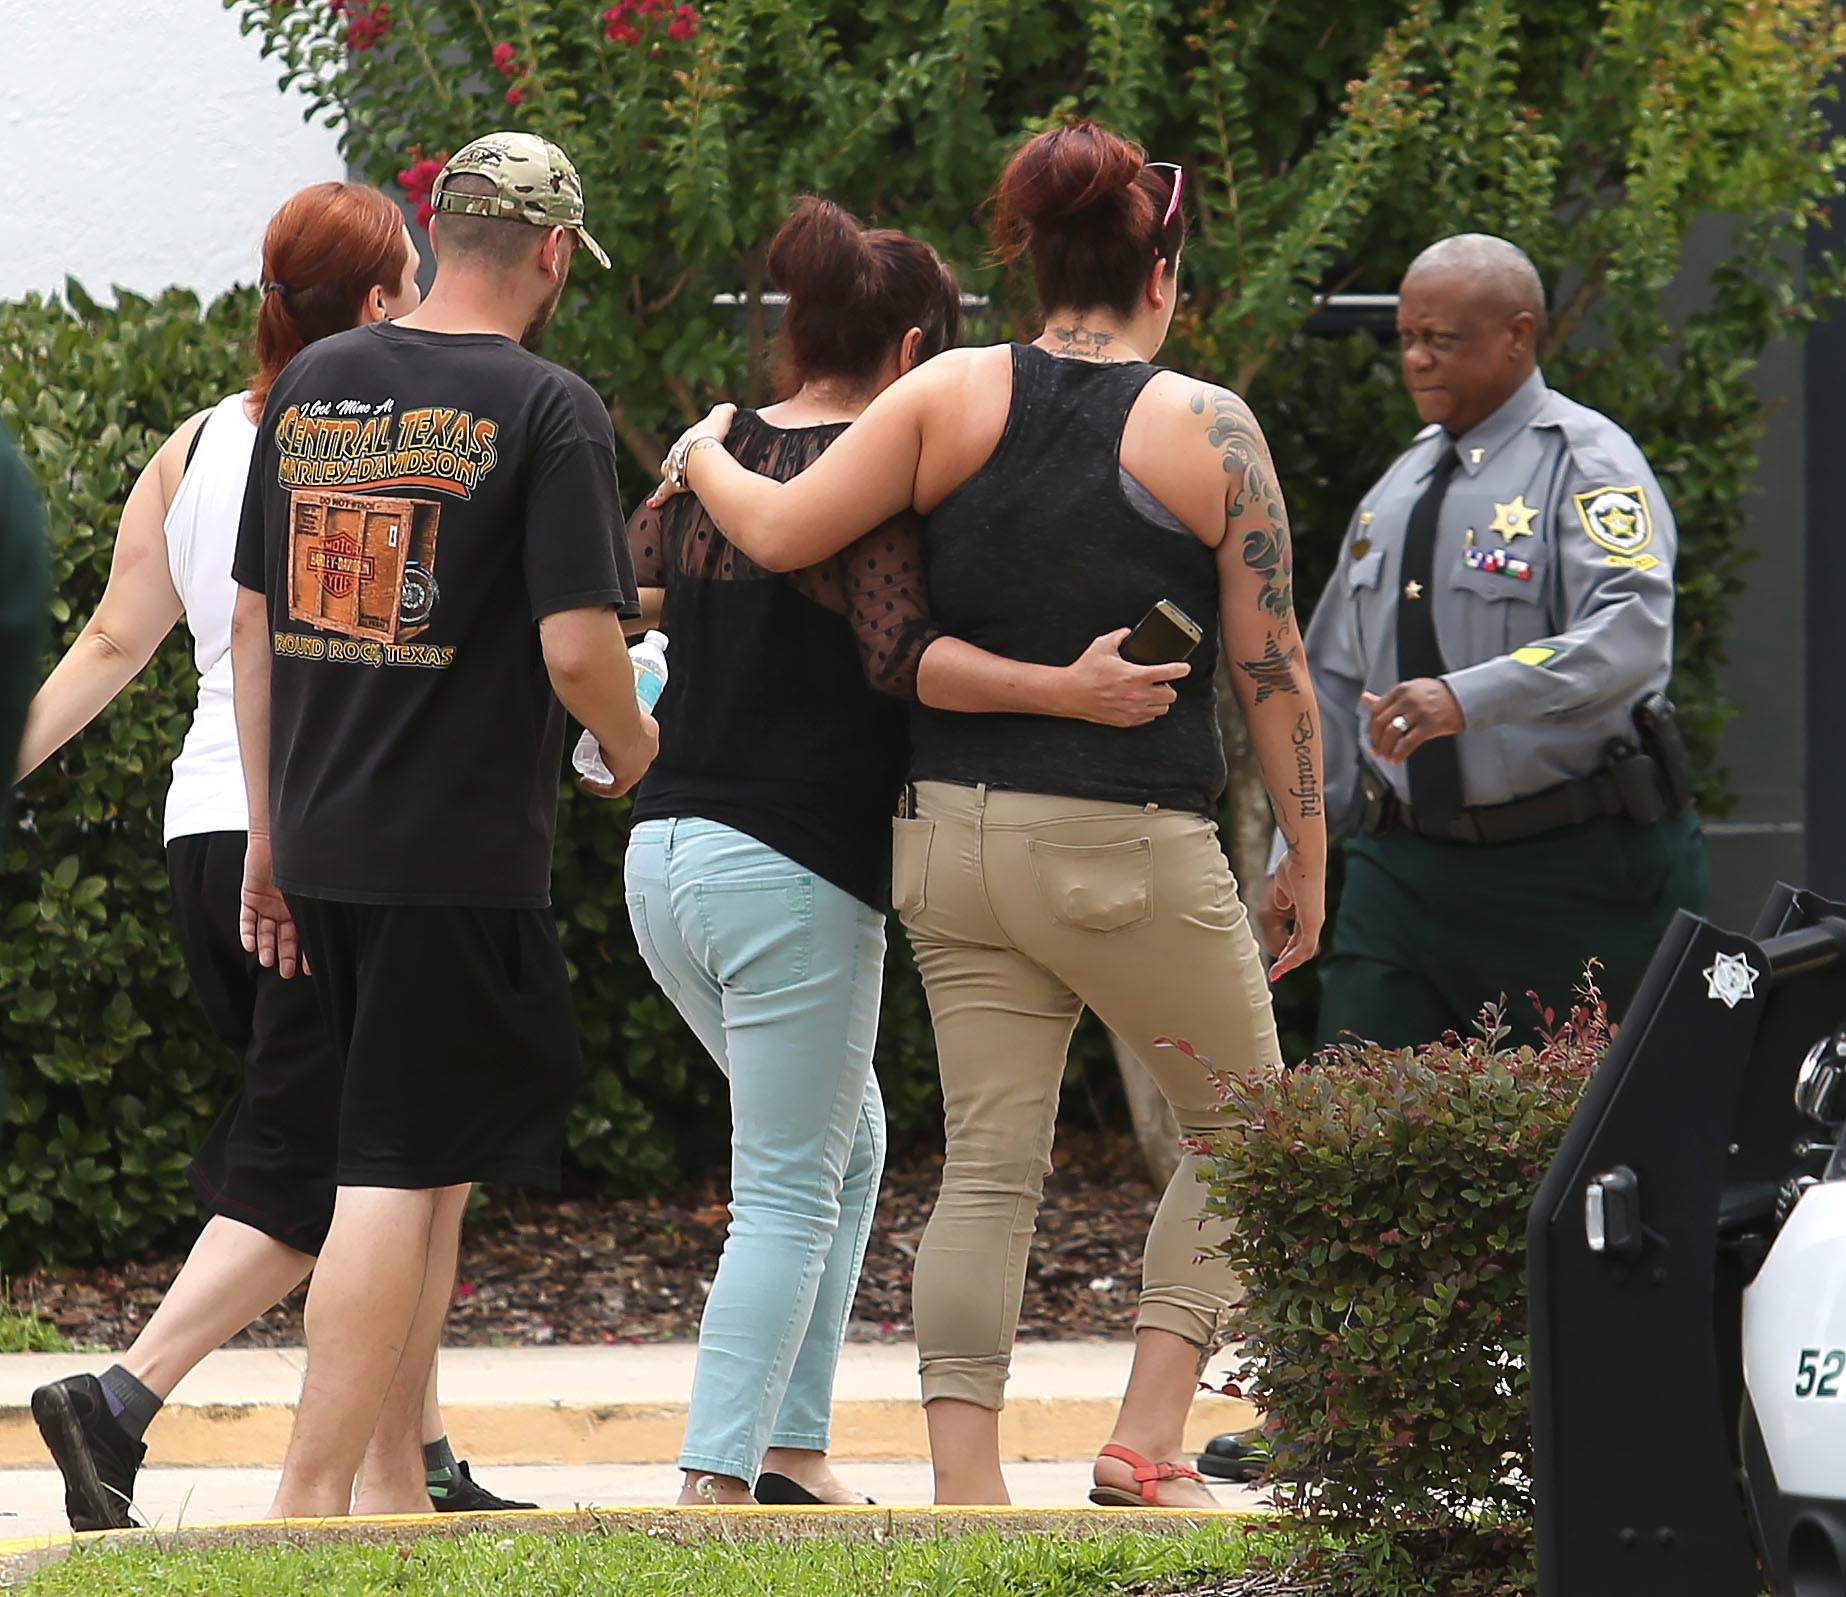 Orlando Workplace Shooting: Former Employee Kills 5, Then